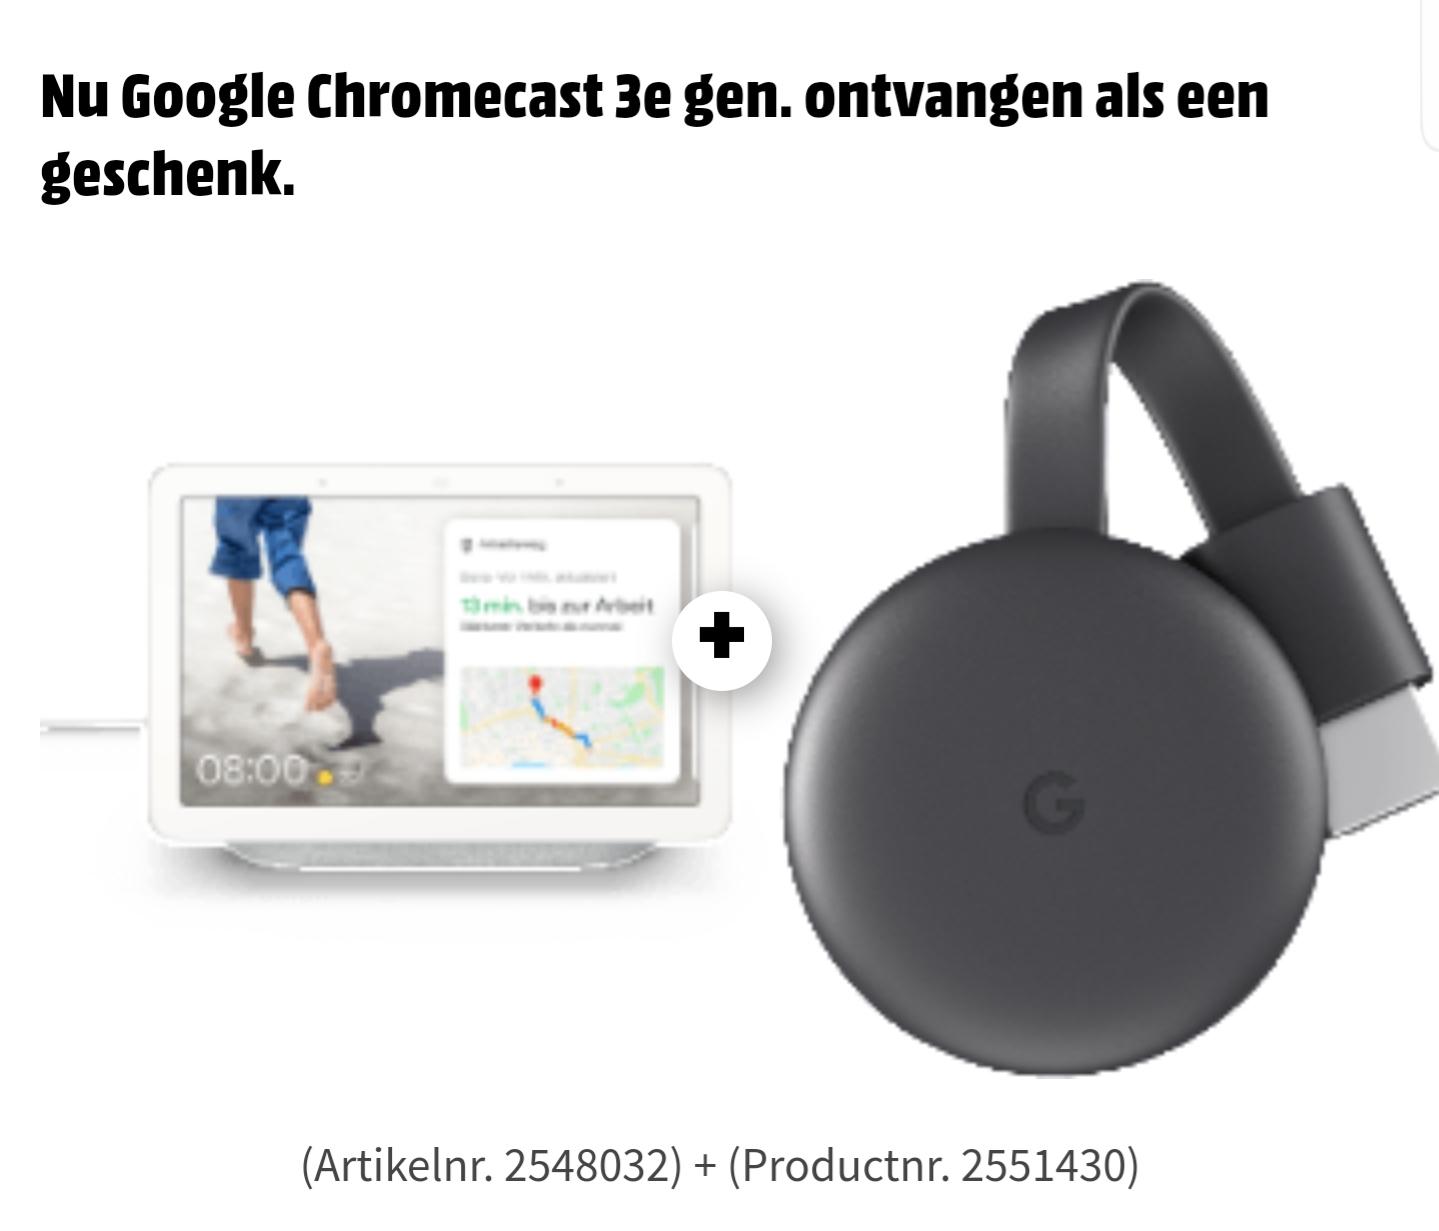 [Grensdeal DE] Google Nest Hub met gratis Chromecast 3 @MediaMarkt Duitsland